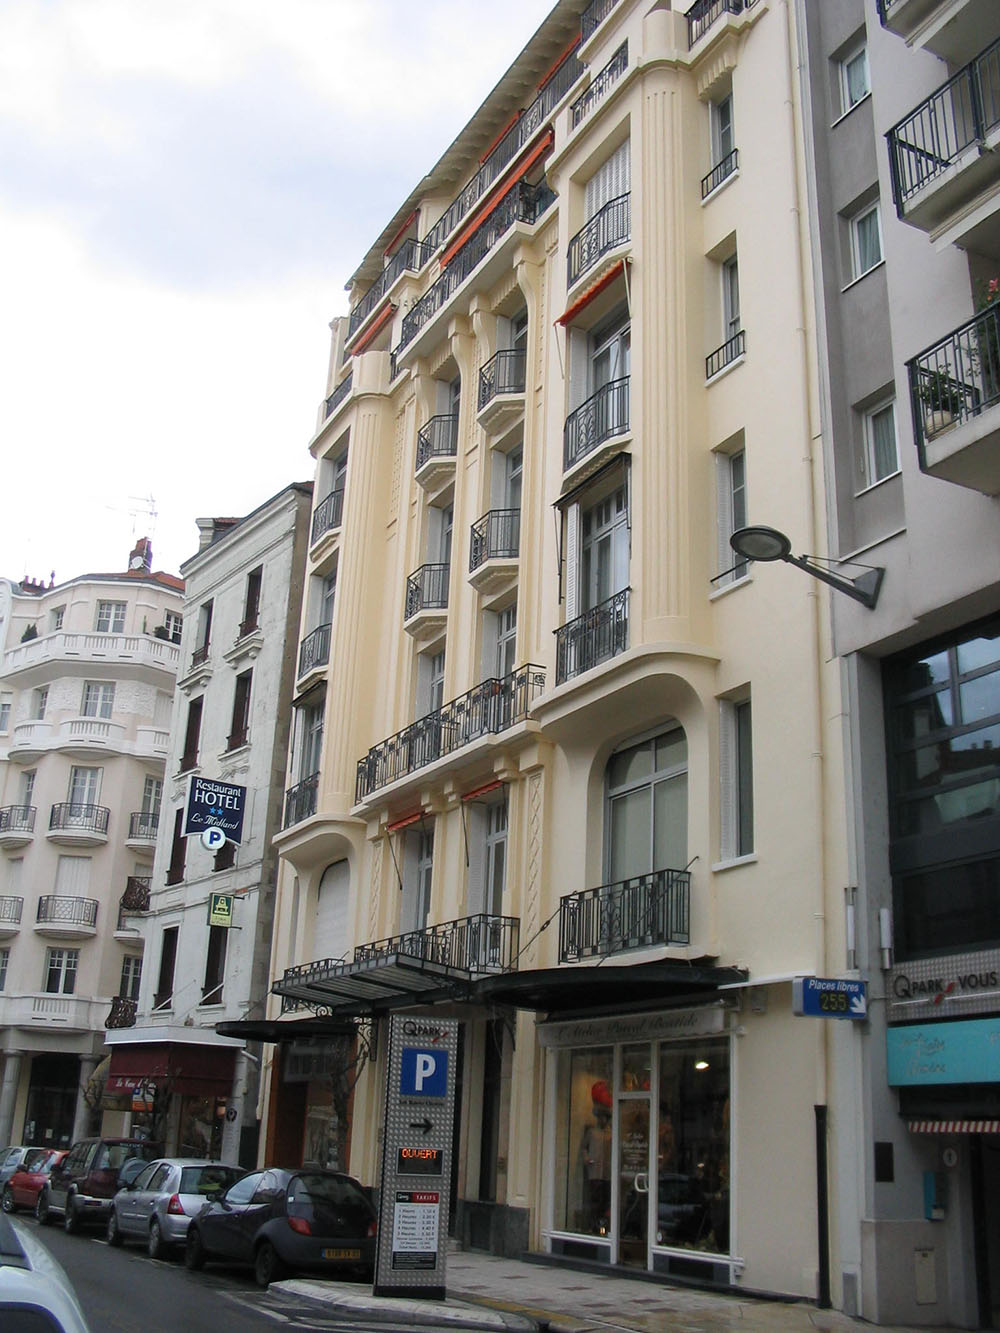 Former Hôtel Britannique